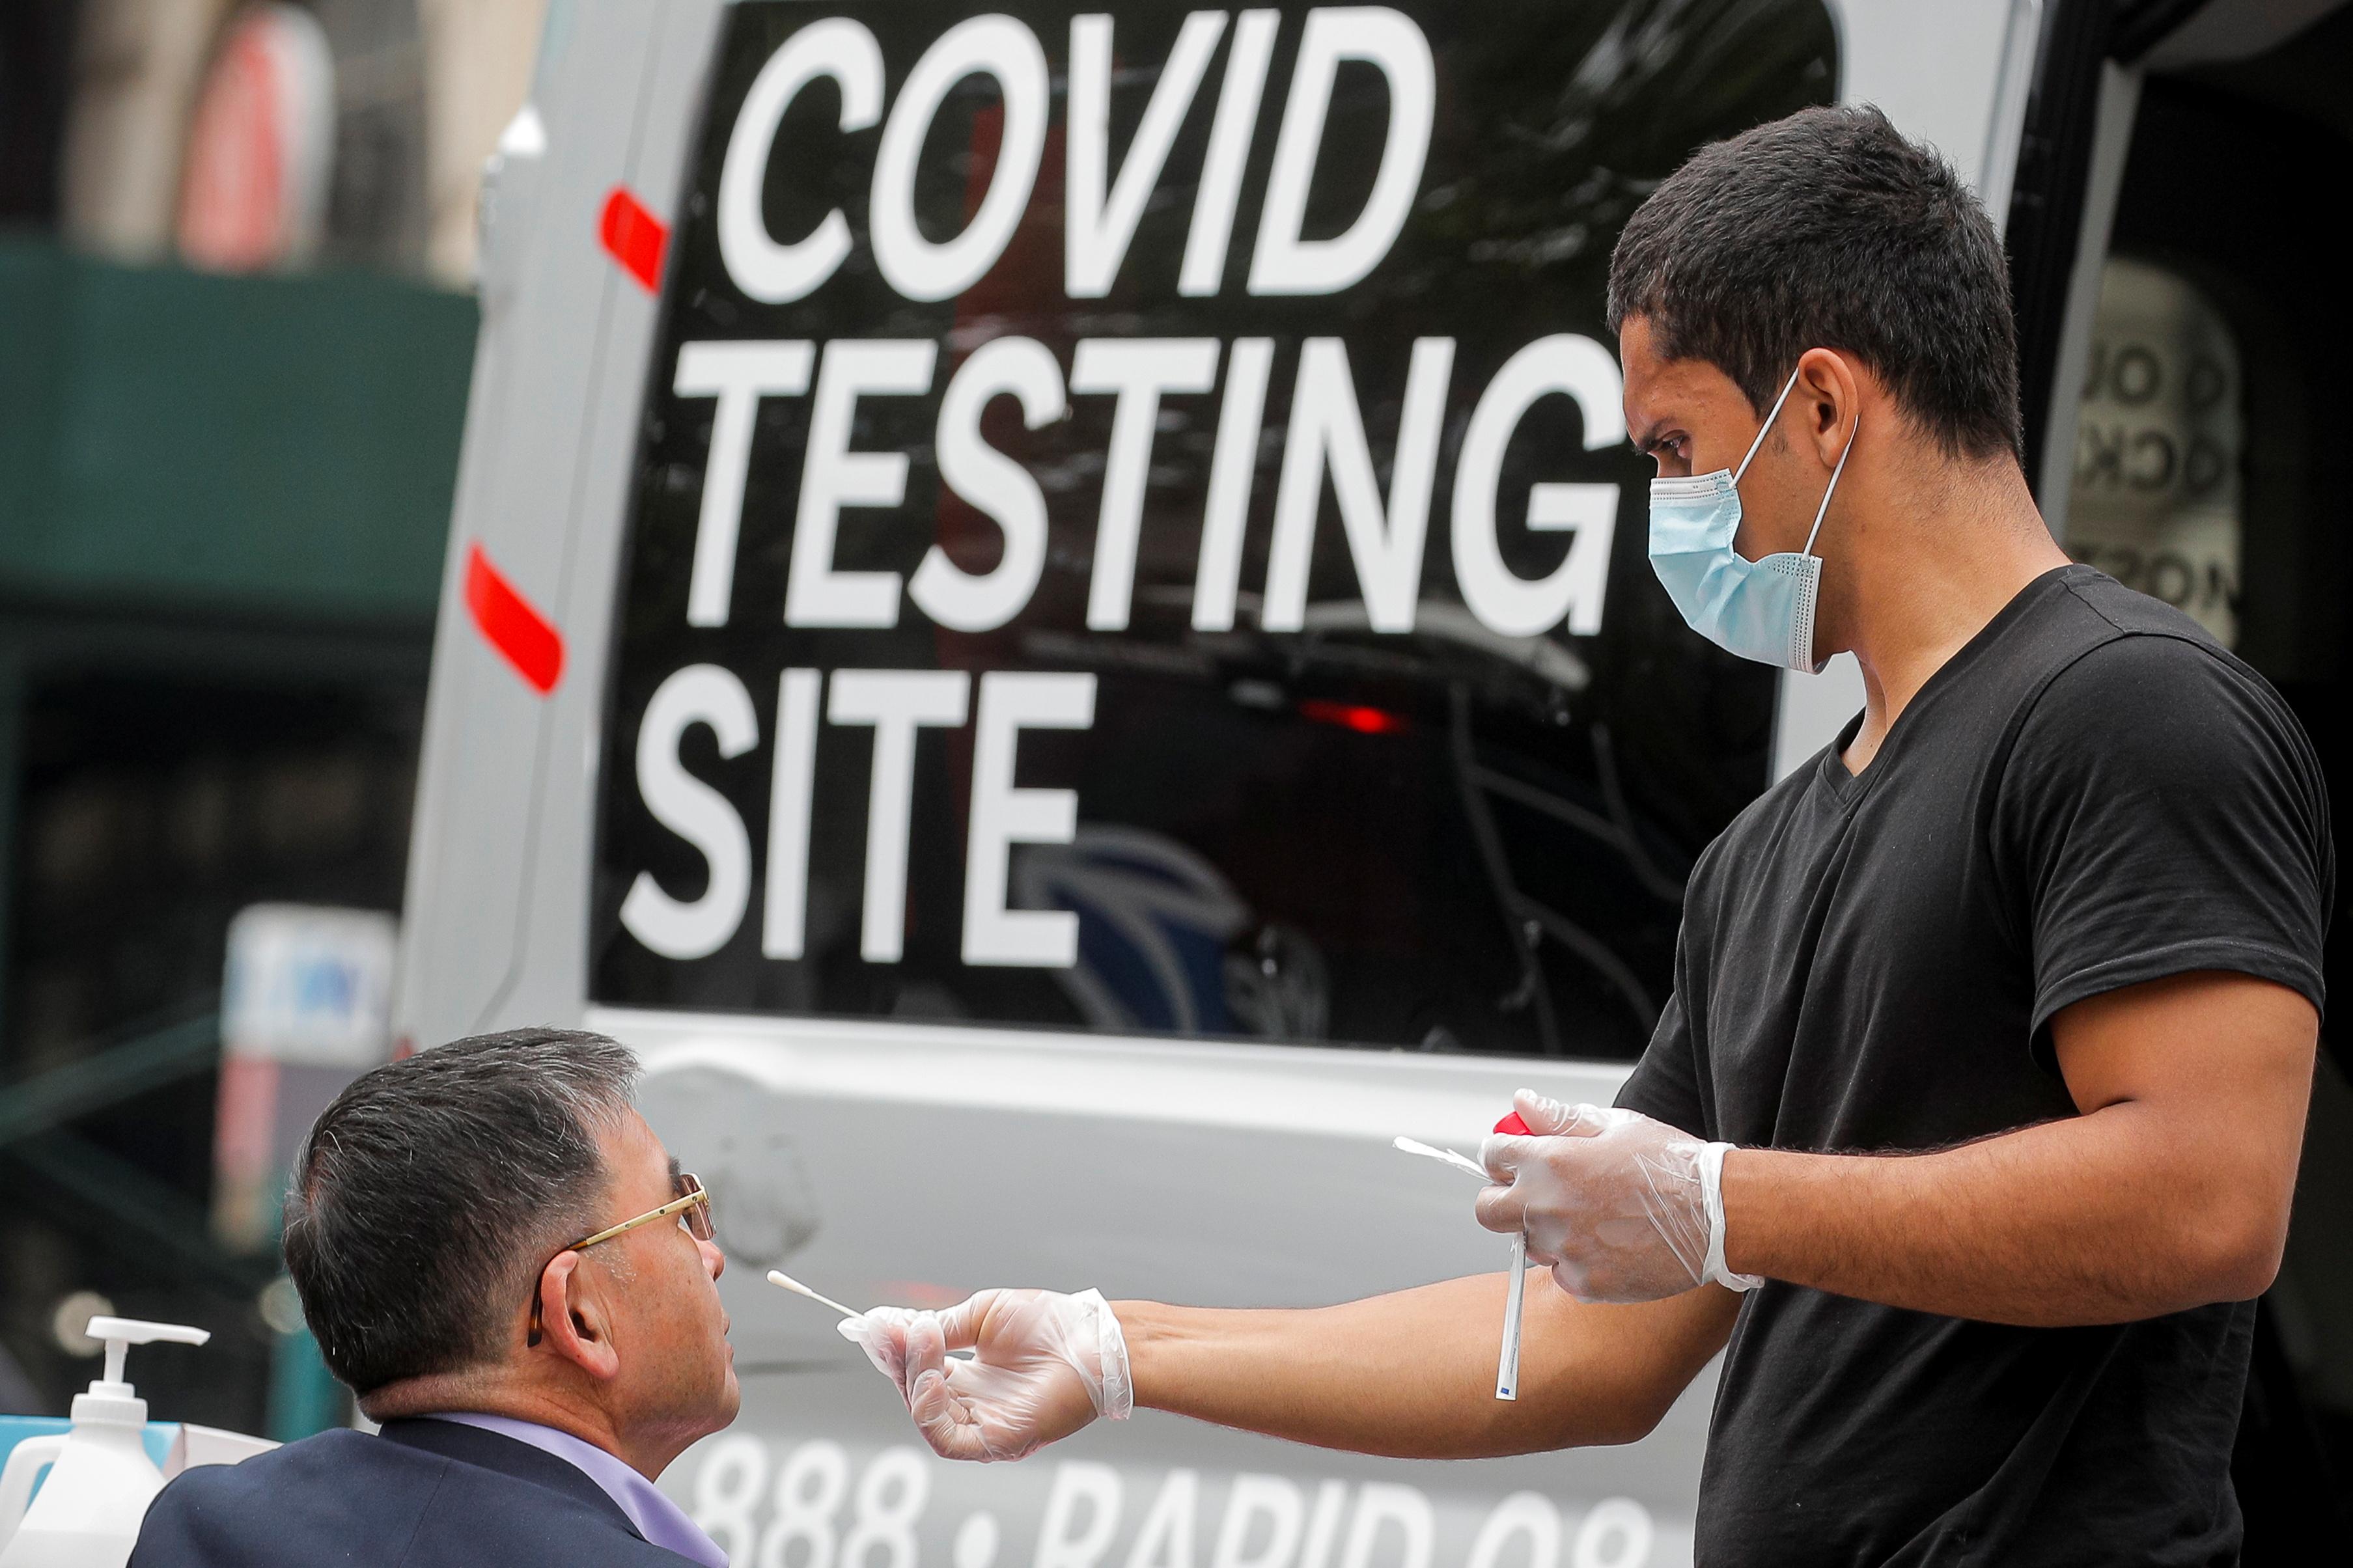 A man receives a coronavirus disease (COVID-19) test at a mobile testing van in Brooklyn, New York, U.S., June 2, 2021. REUTERS/Brendan McDermid